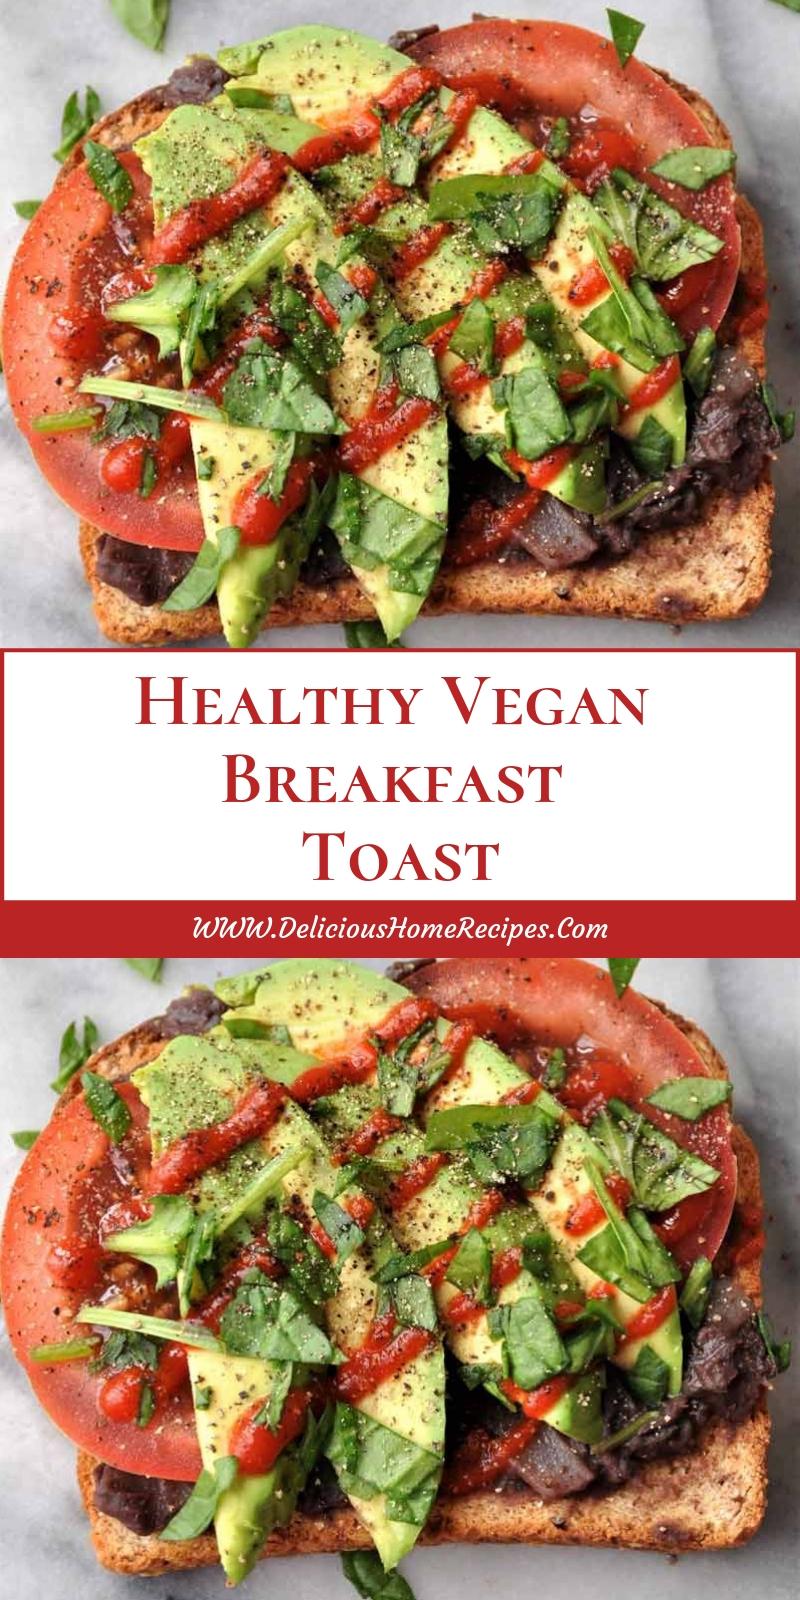 Healthy Vegan Breakfast Toast